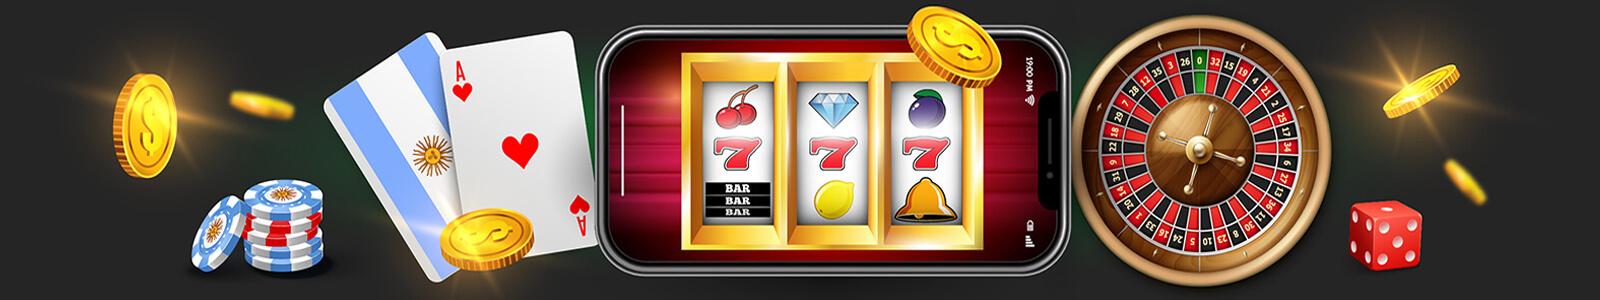 Casinos online para móviles